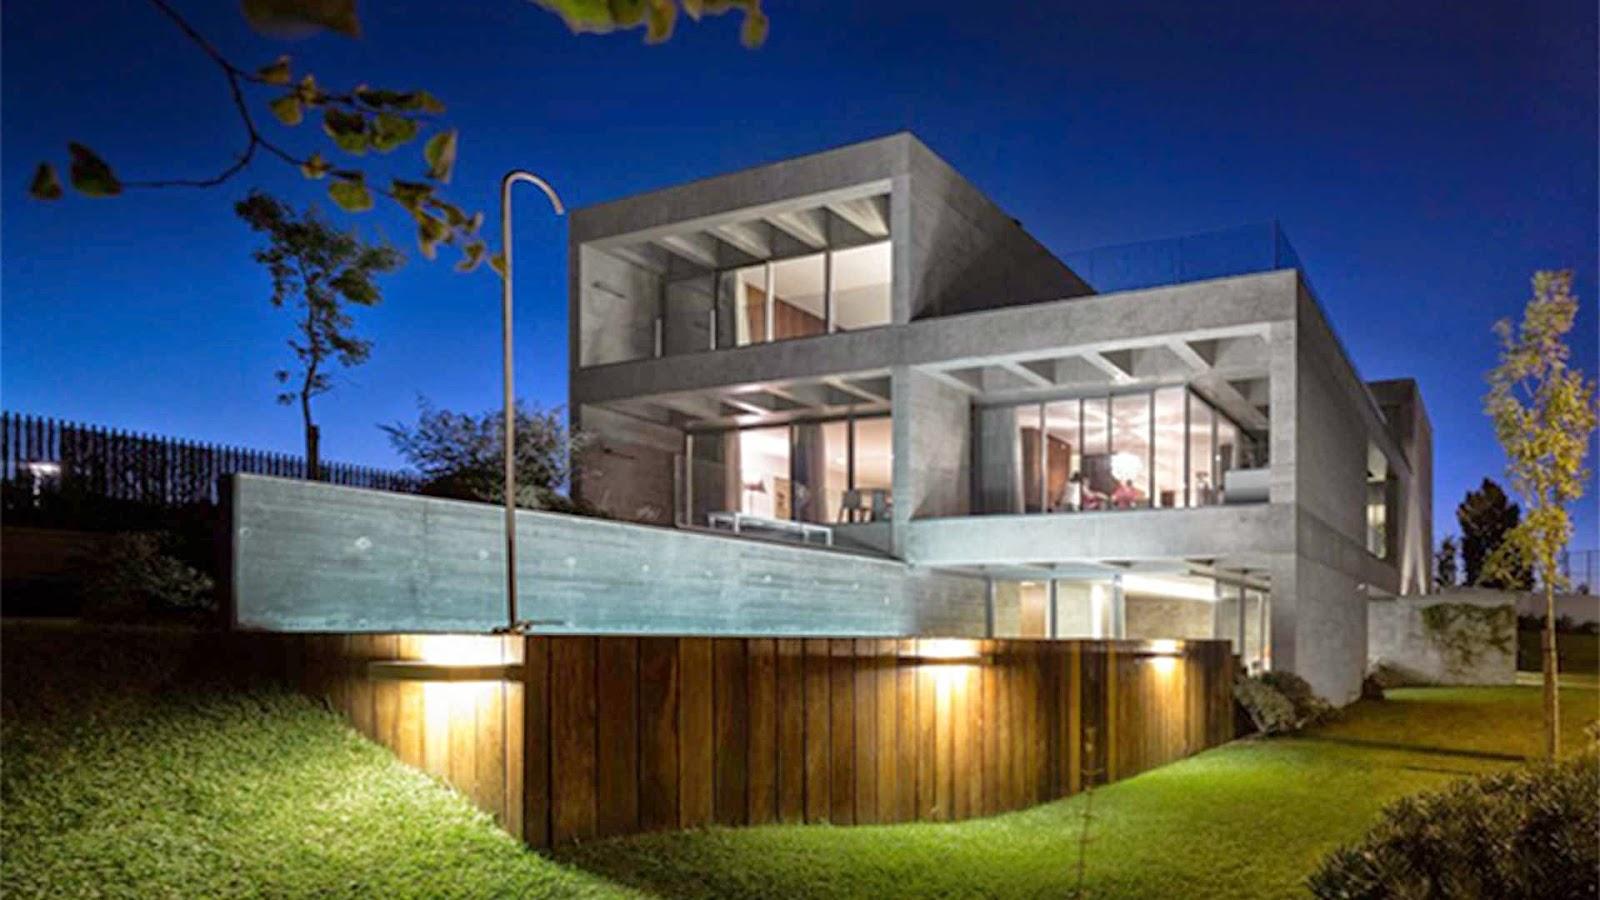 Rumahab Arsitektur Rumah Minimalis 3 Lantai